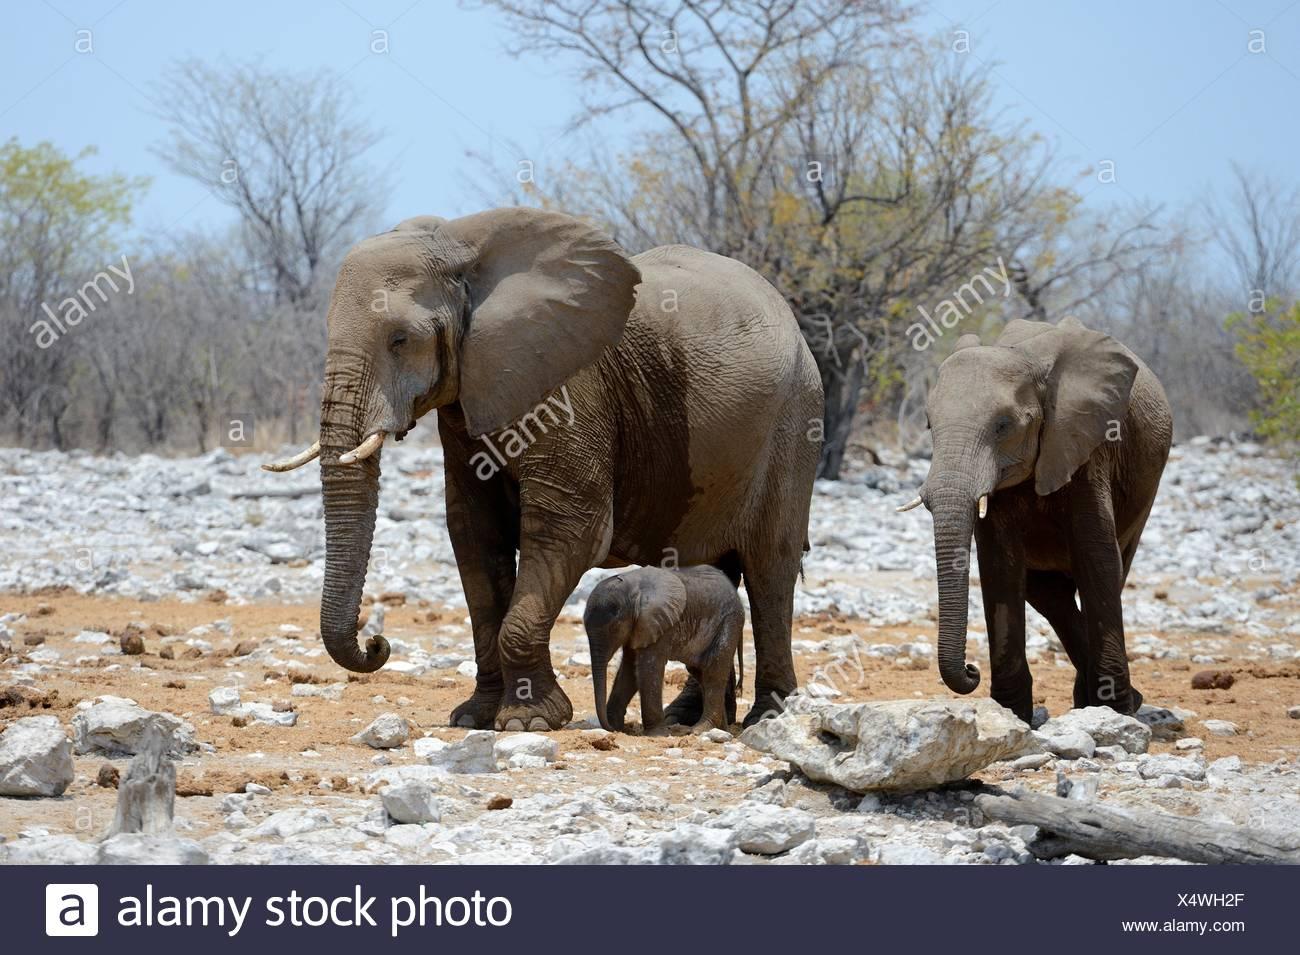 African elephant female staying next to her very young calf (Loxodonta africana) Etosha National Park, Namibia, Africa. Stock Photo